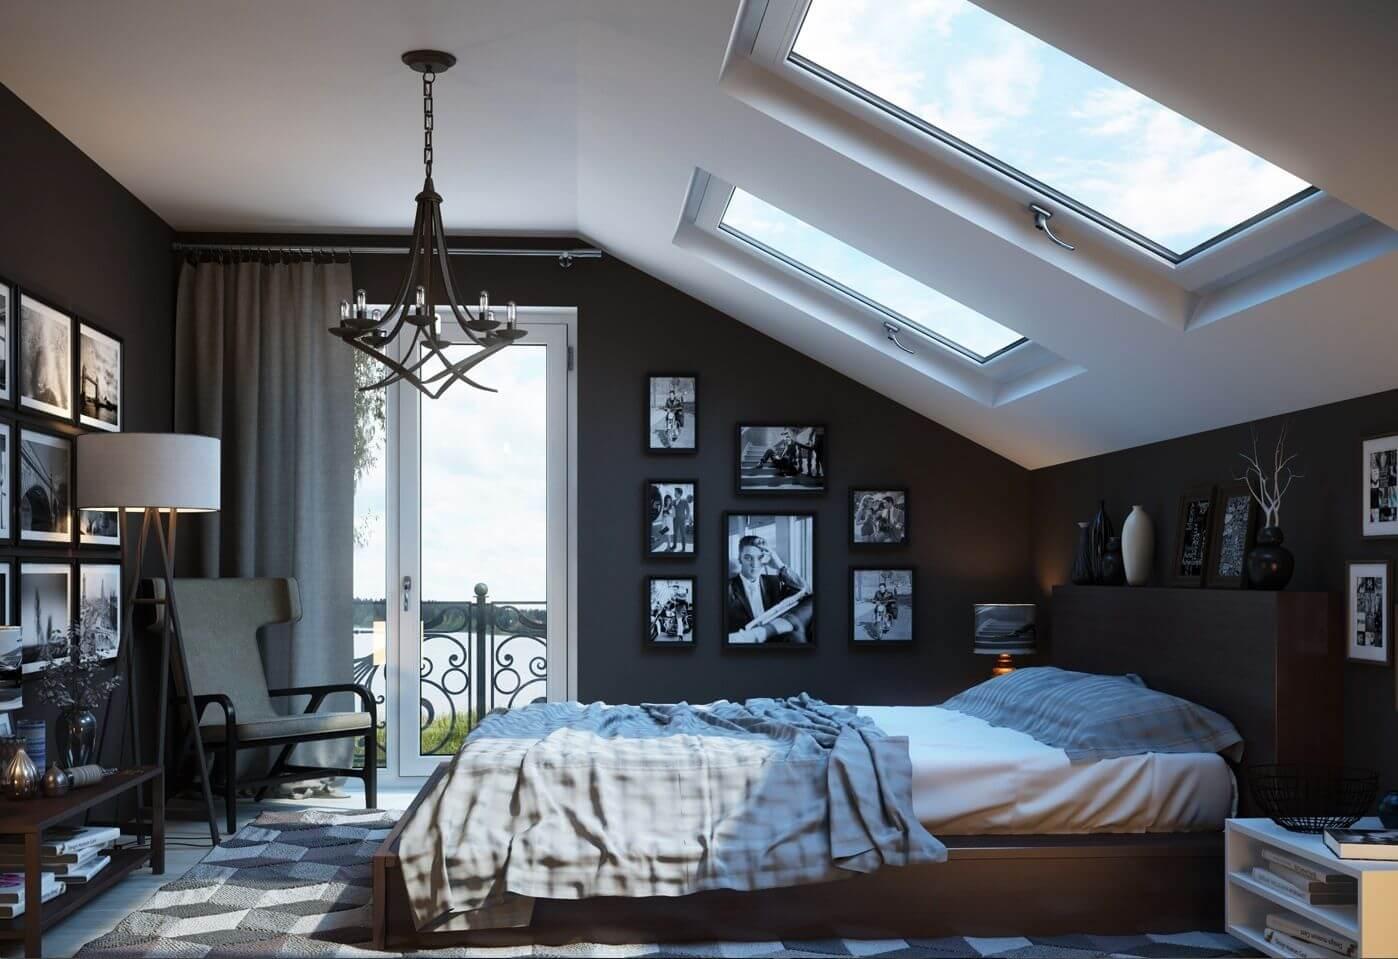 Fashionable adult bedroom